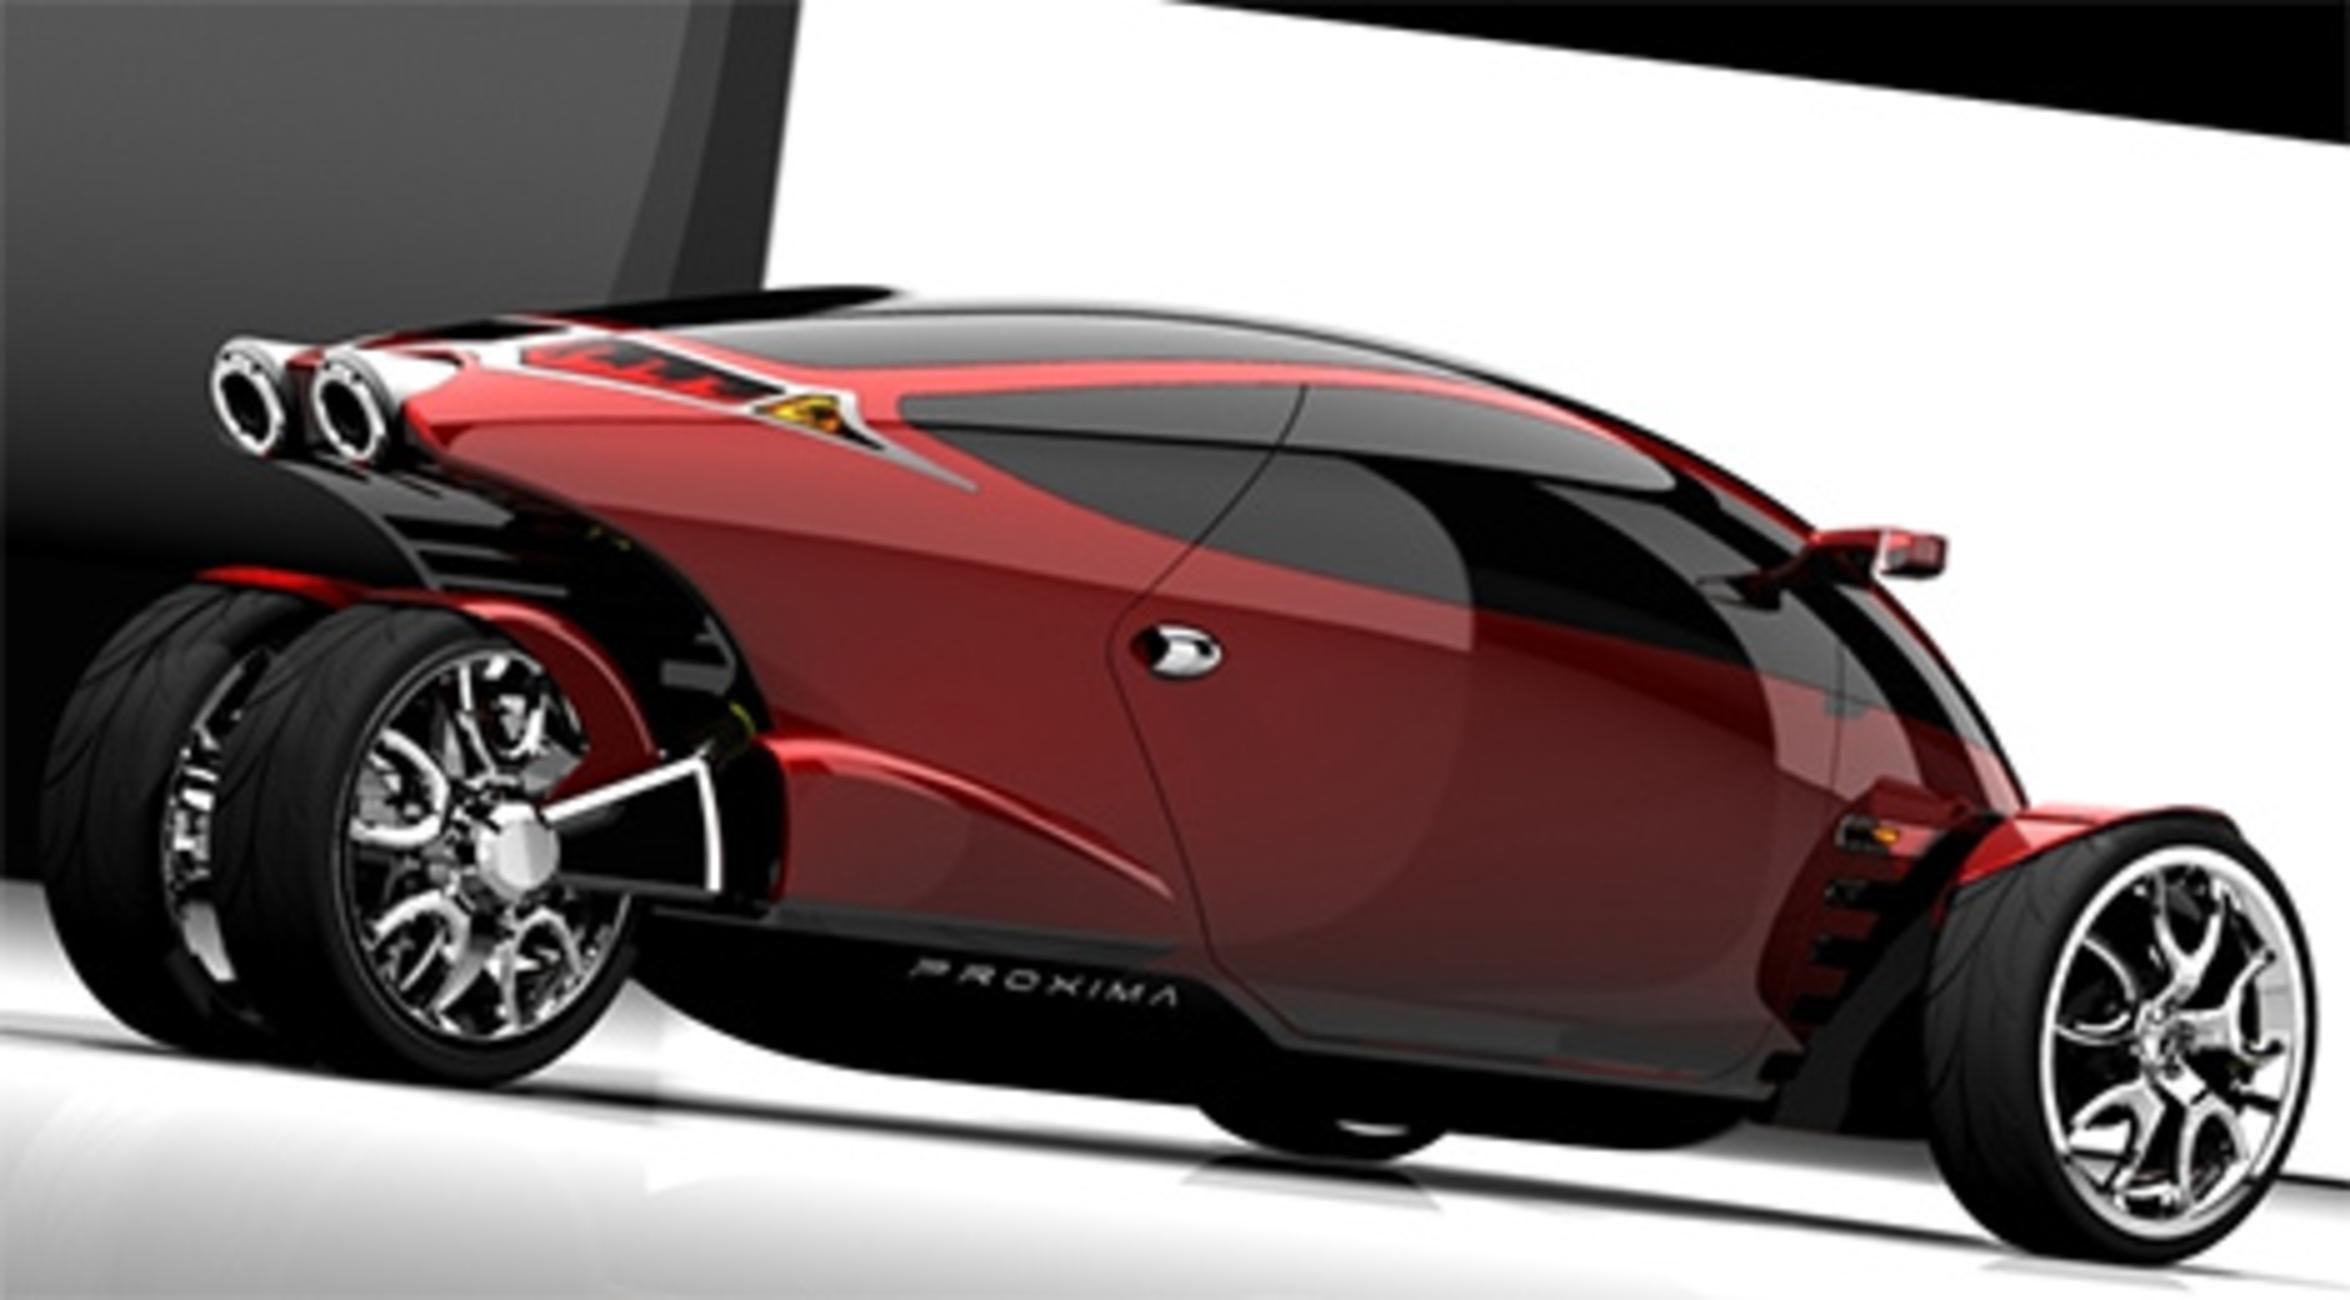 Coolest Ever Proxima Car Bike Hybrid Hybrid Car Futuristic Cars